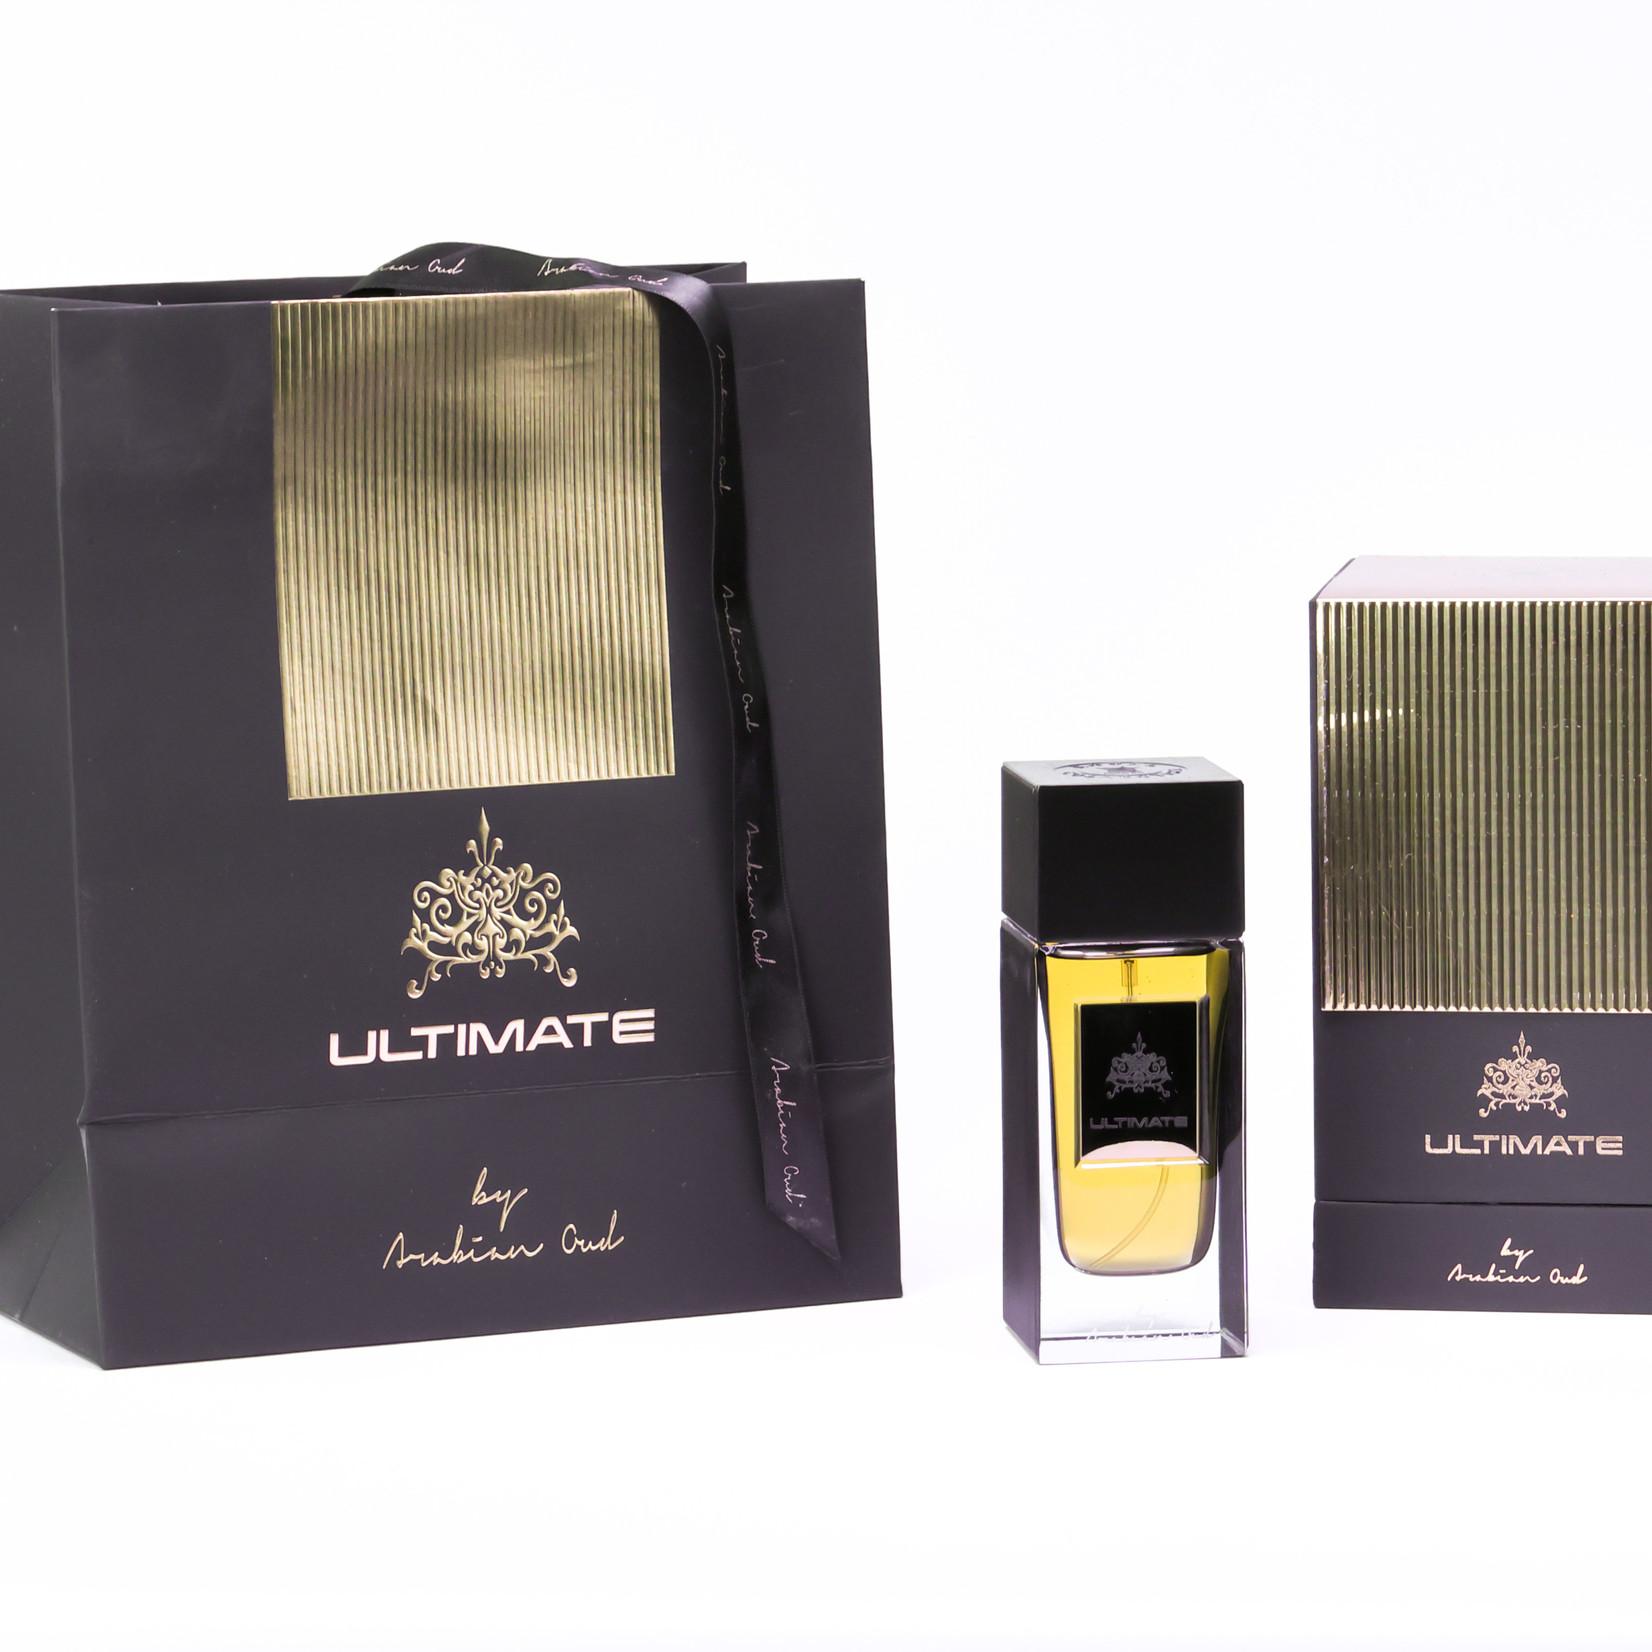 Arabian Oud Ultimate (100ml Eau de Parfum)